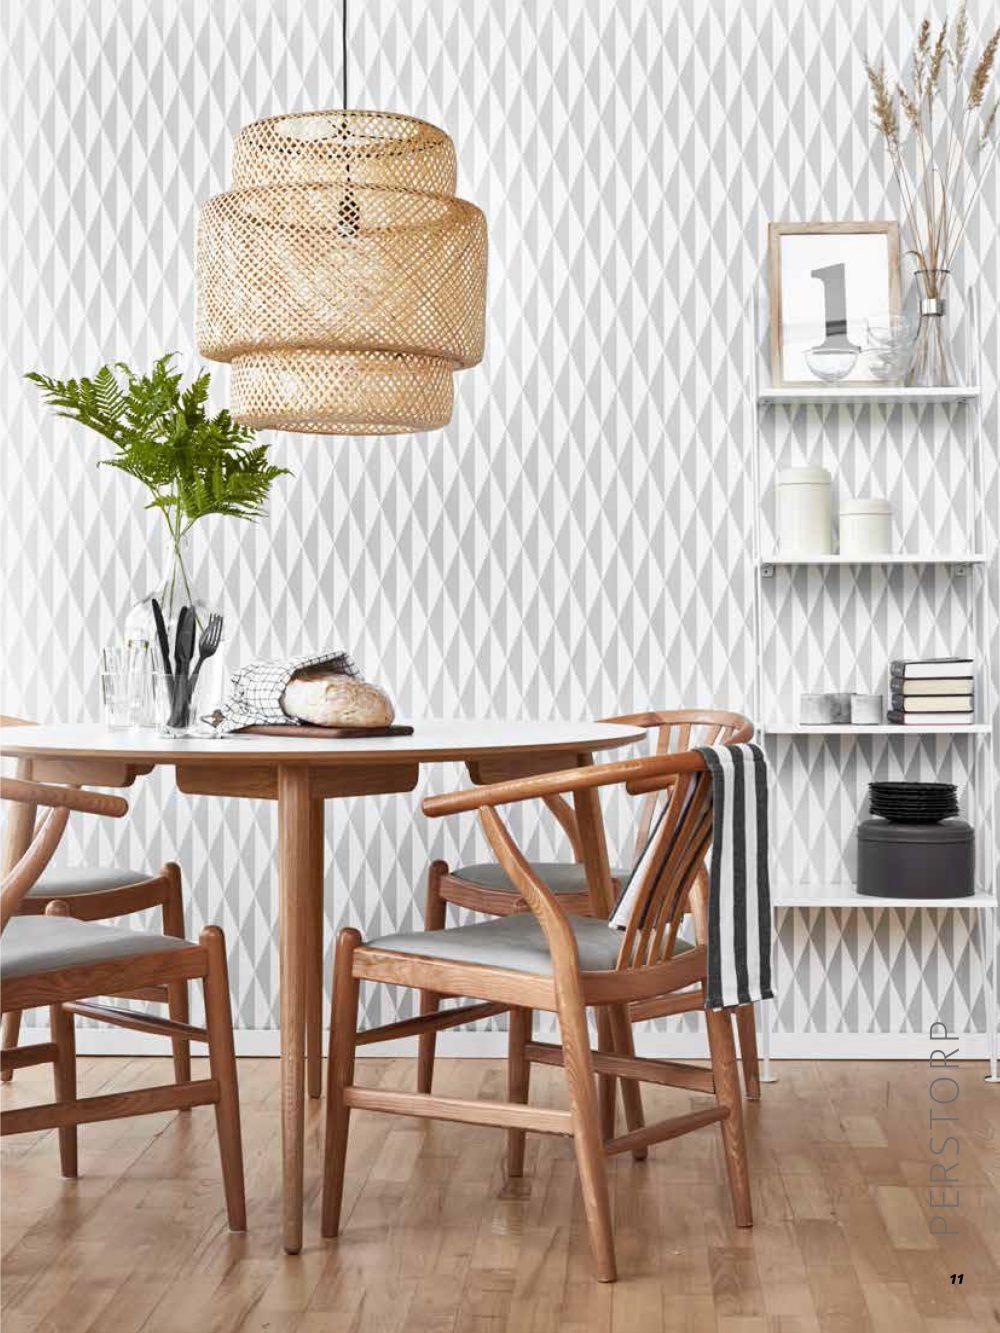 Perstorp runt matbord vit miljö